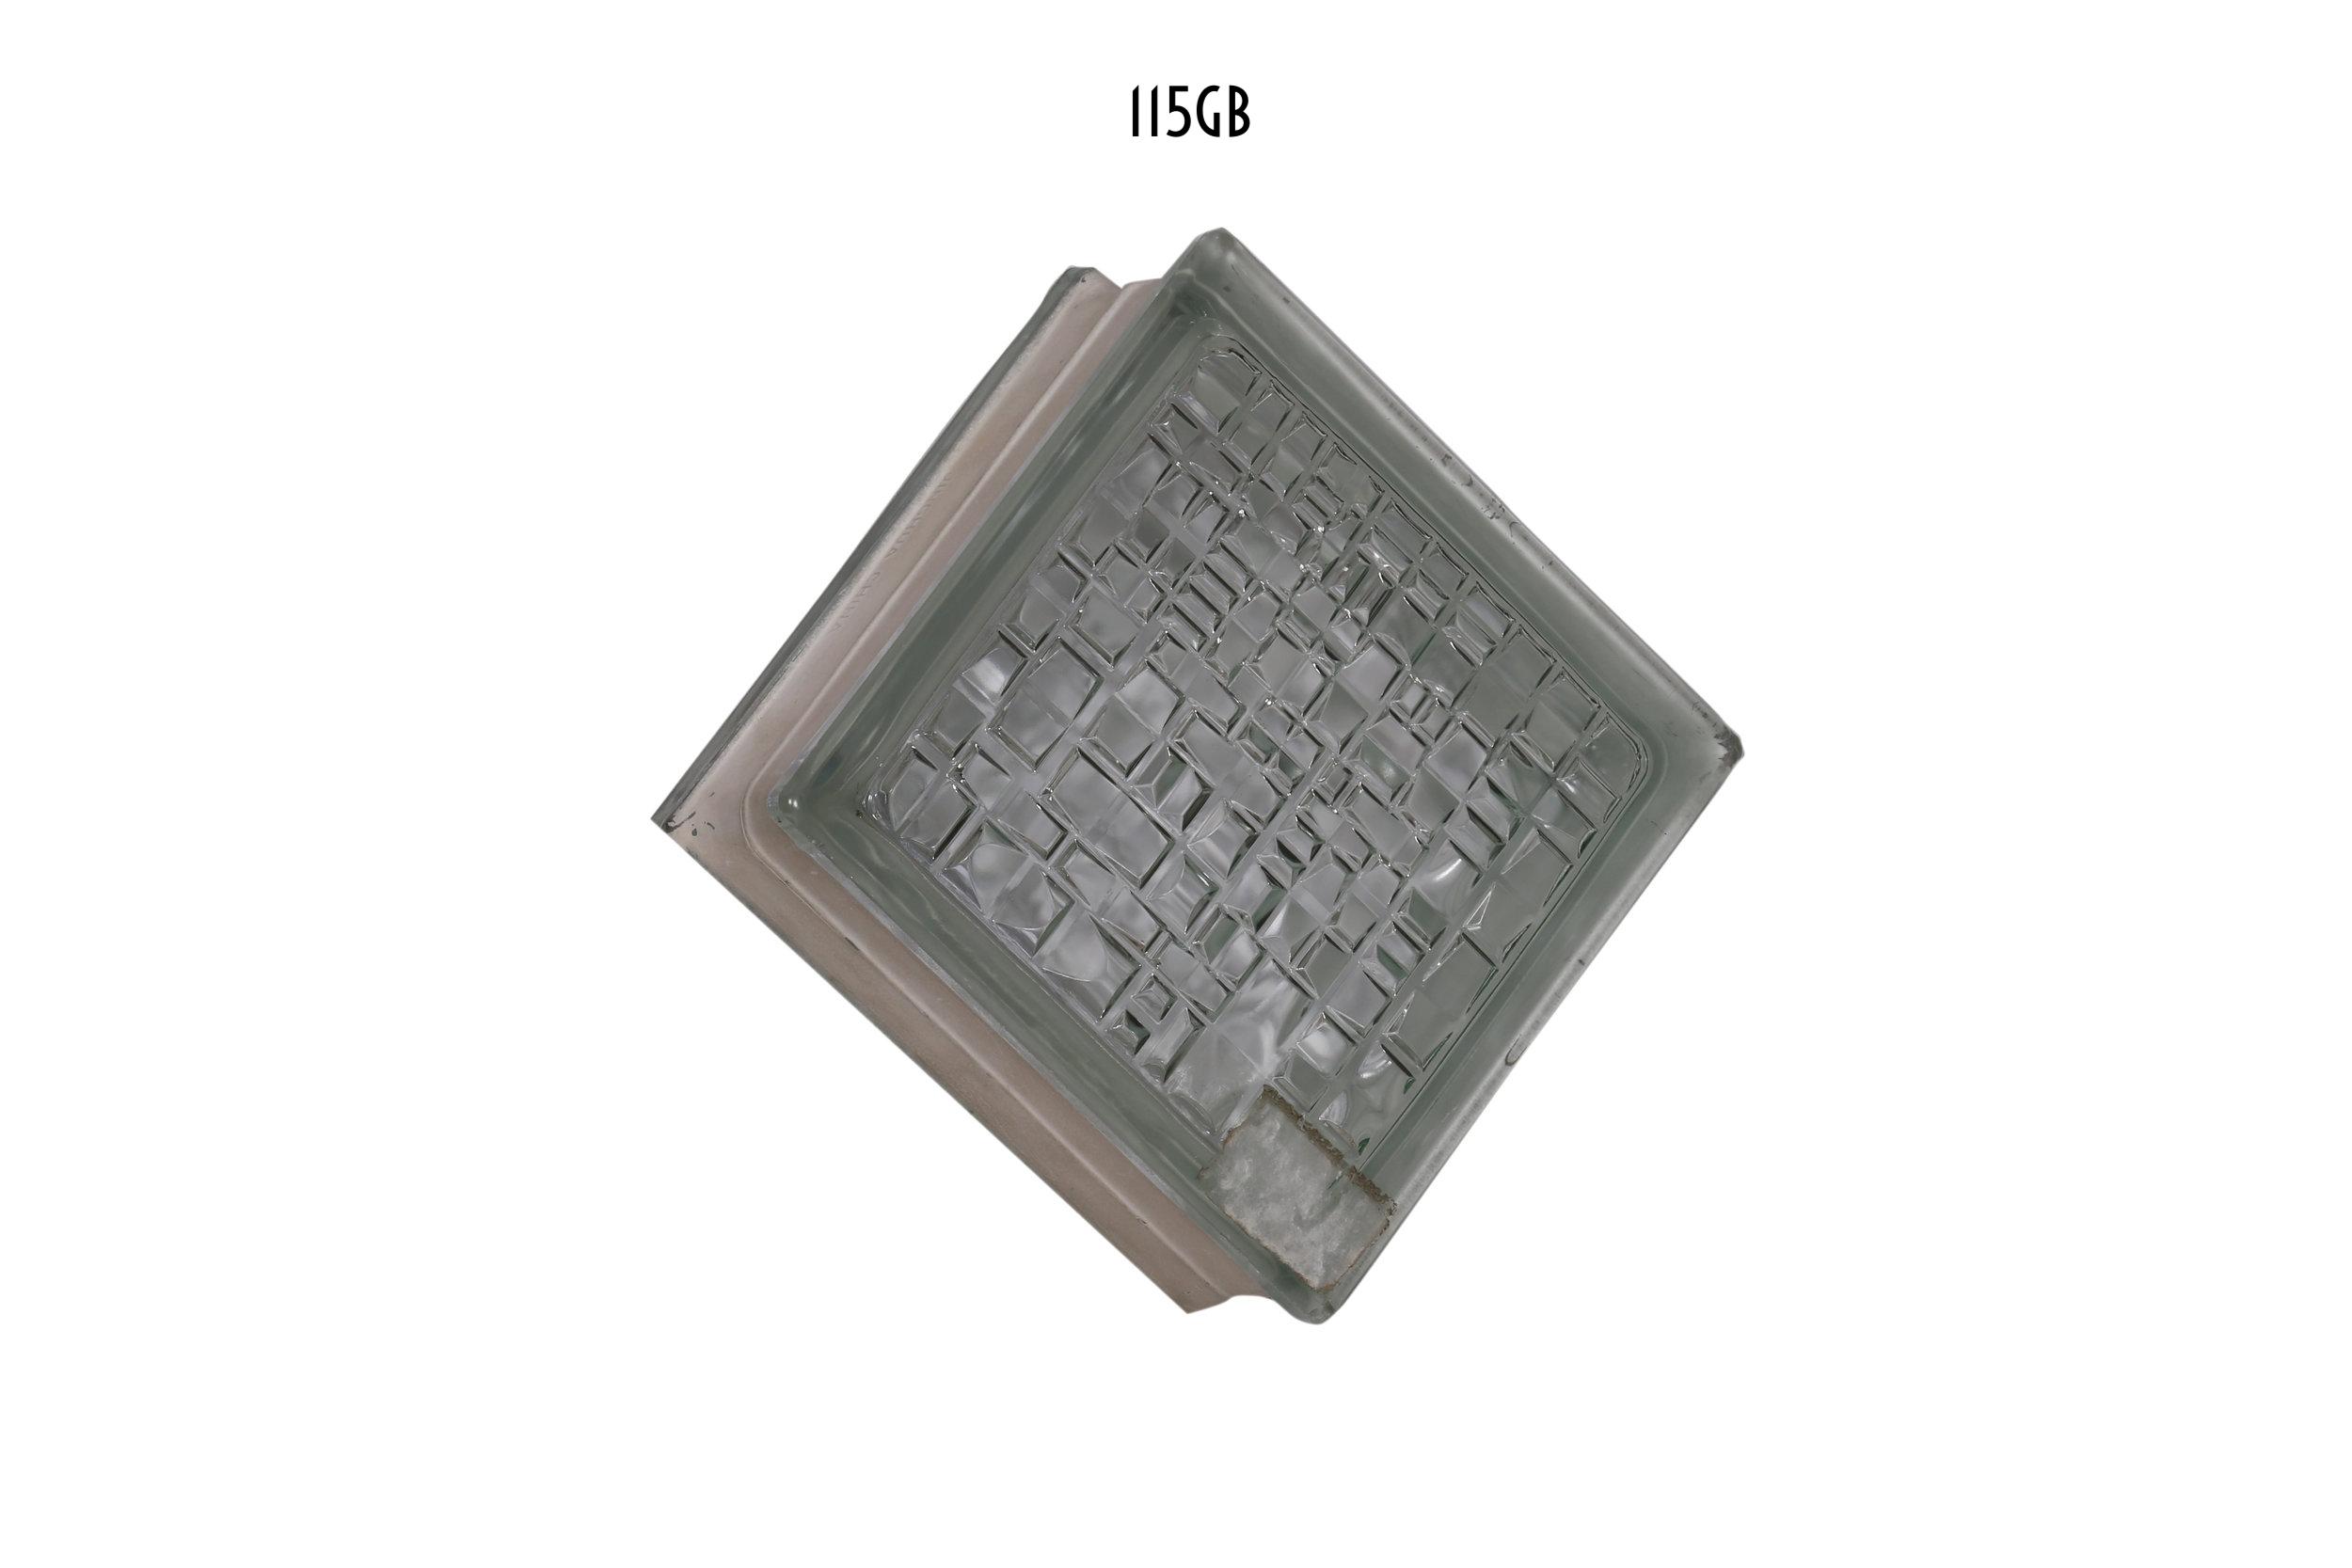 115GB